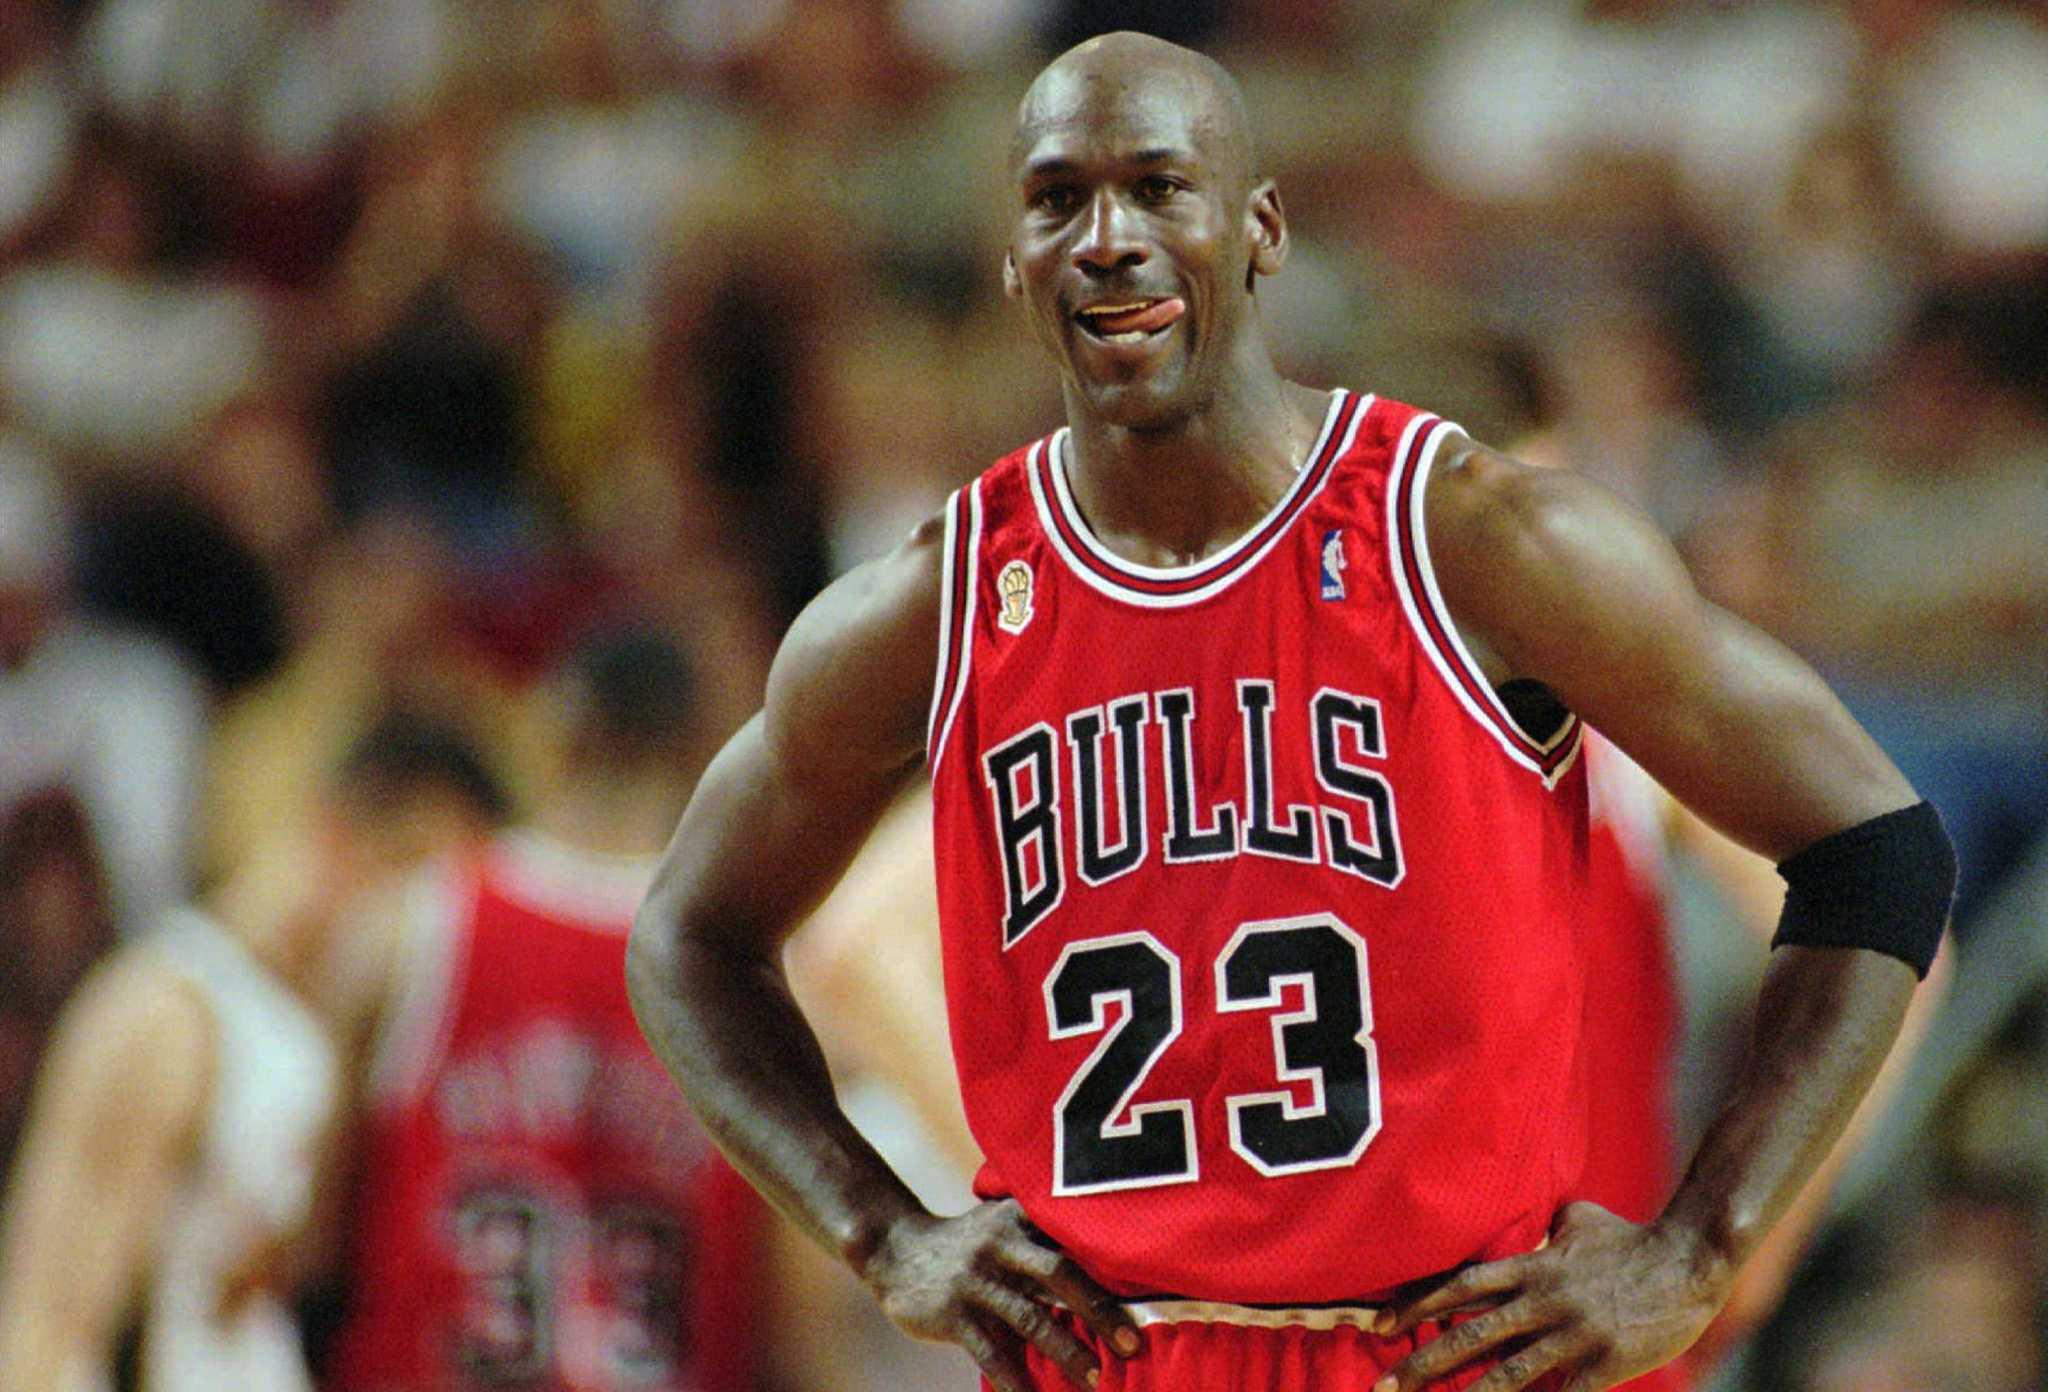 Mejores jugadores de la NBA